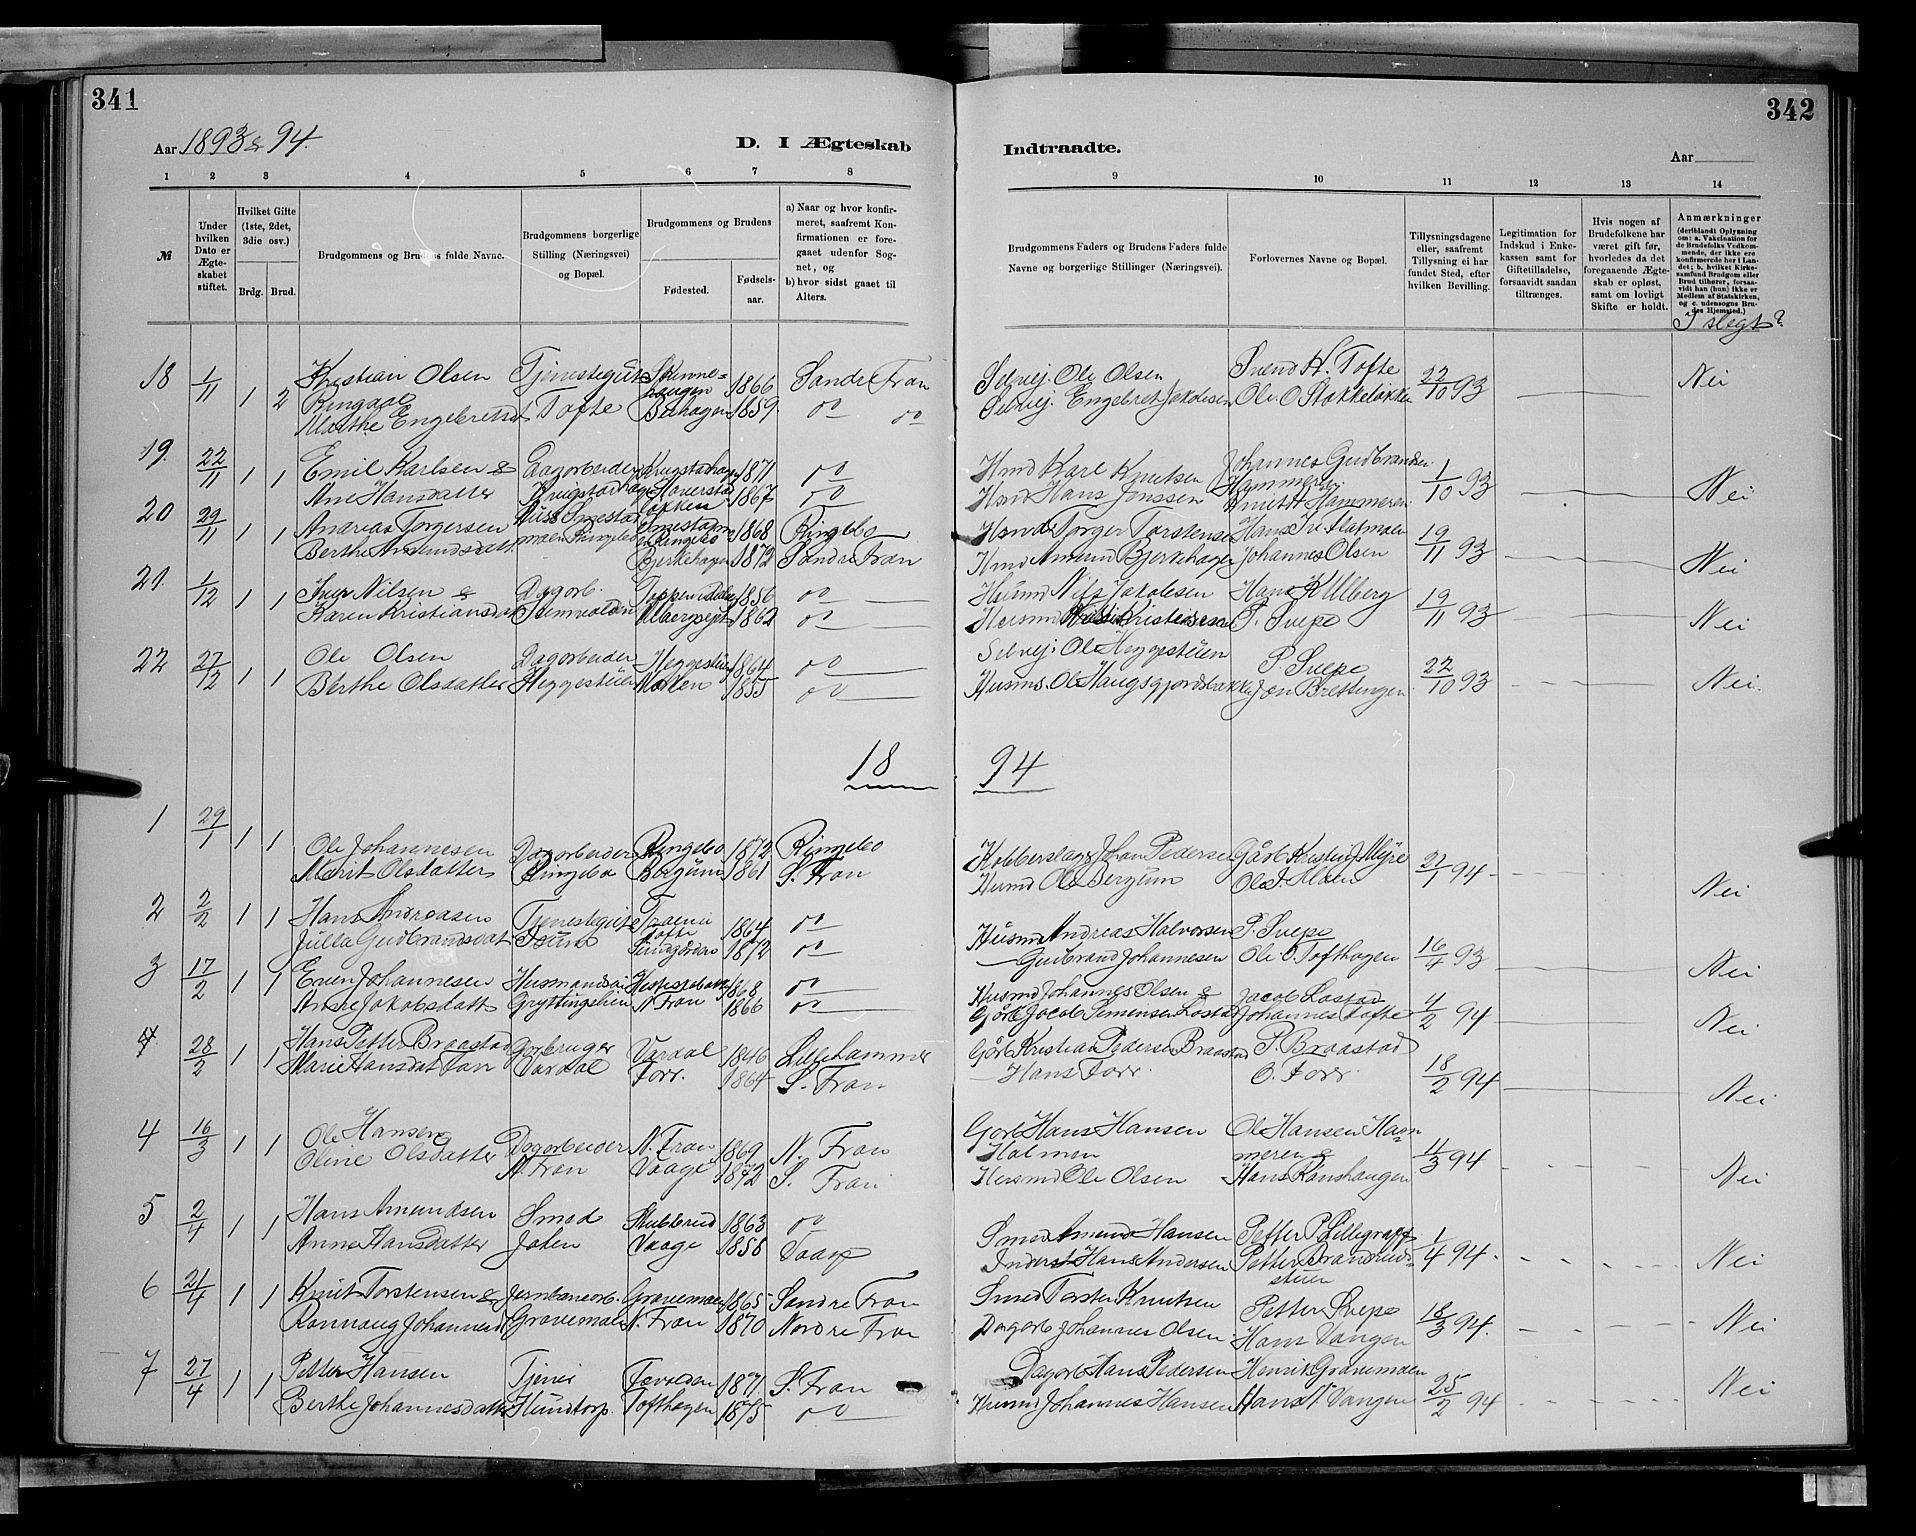 SAH, Sør-Fron prestekontor, H/Ha/Hab/L0003: Klokkerbok nr. 3, 1884-1896, s. 341-342